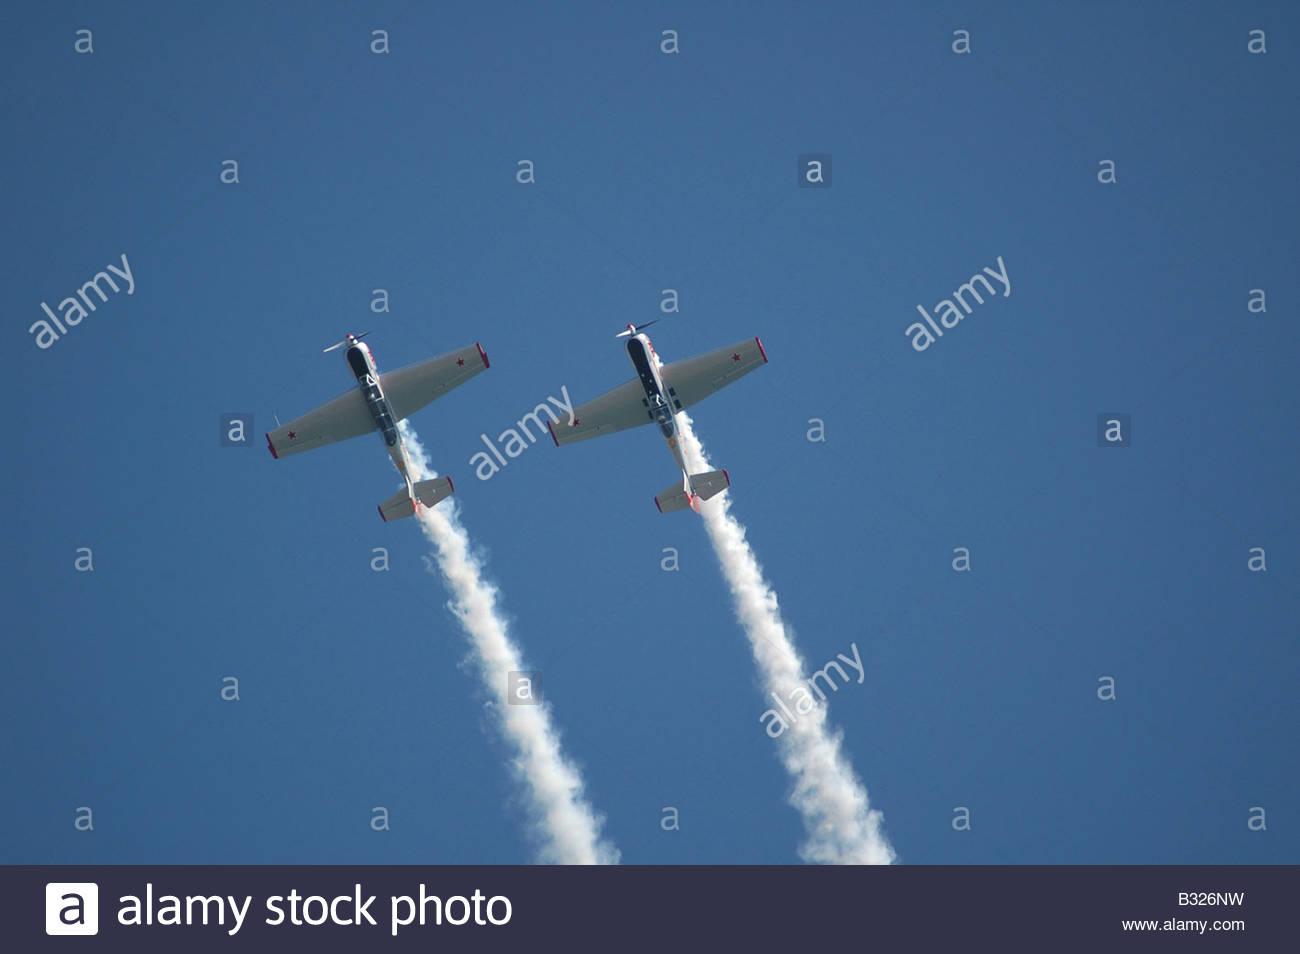 Yakovlevs Aerobatic display team - Stock Image